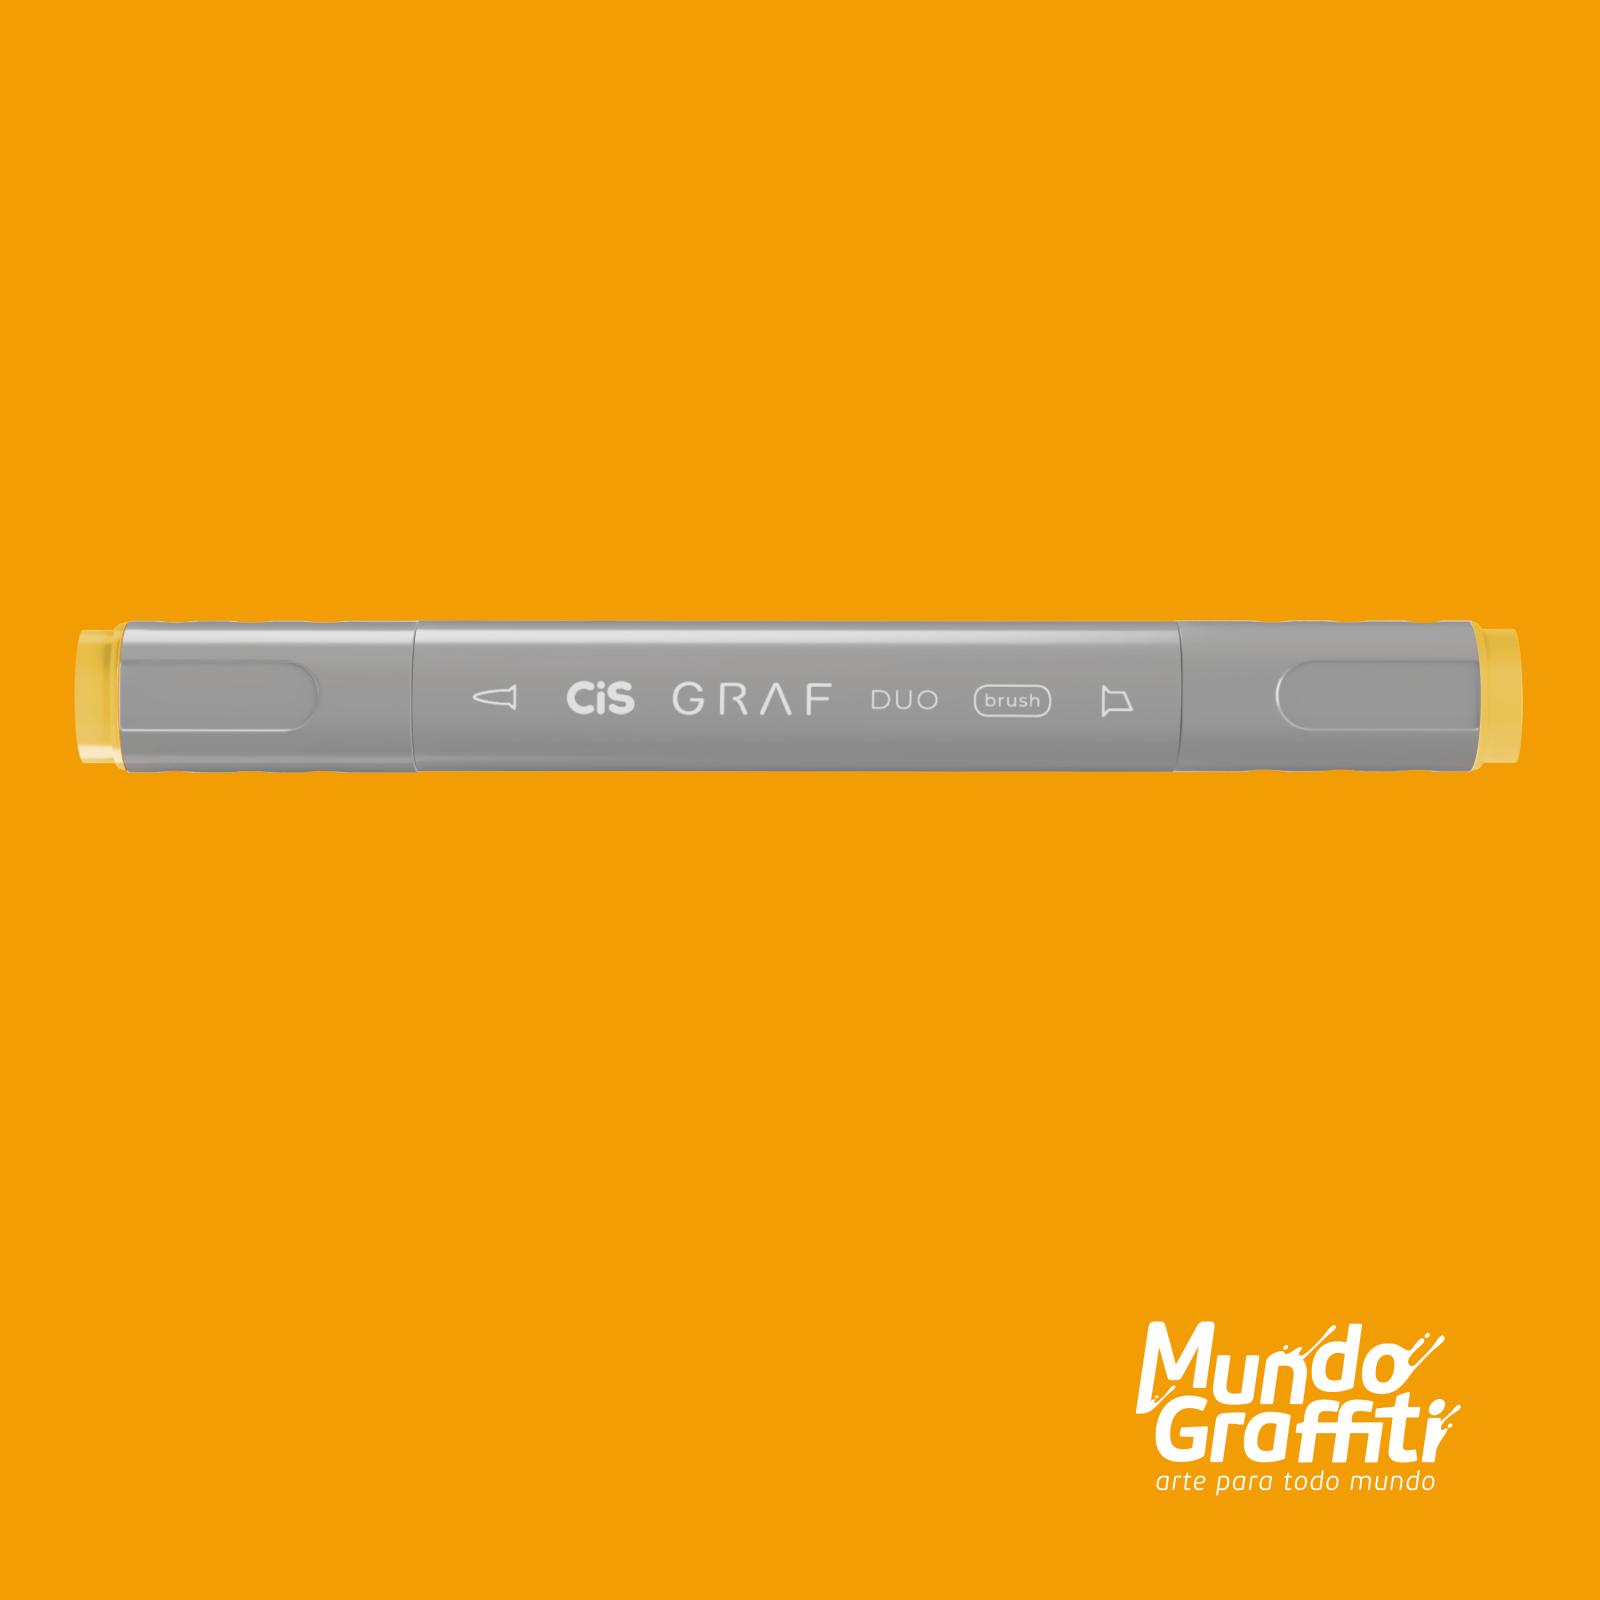 Marcador Cis Graf Duo Brush Deep Yellow 32 - Mundo Graffiti